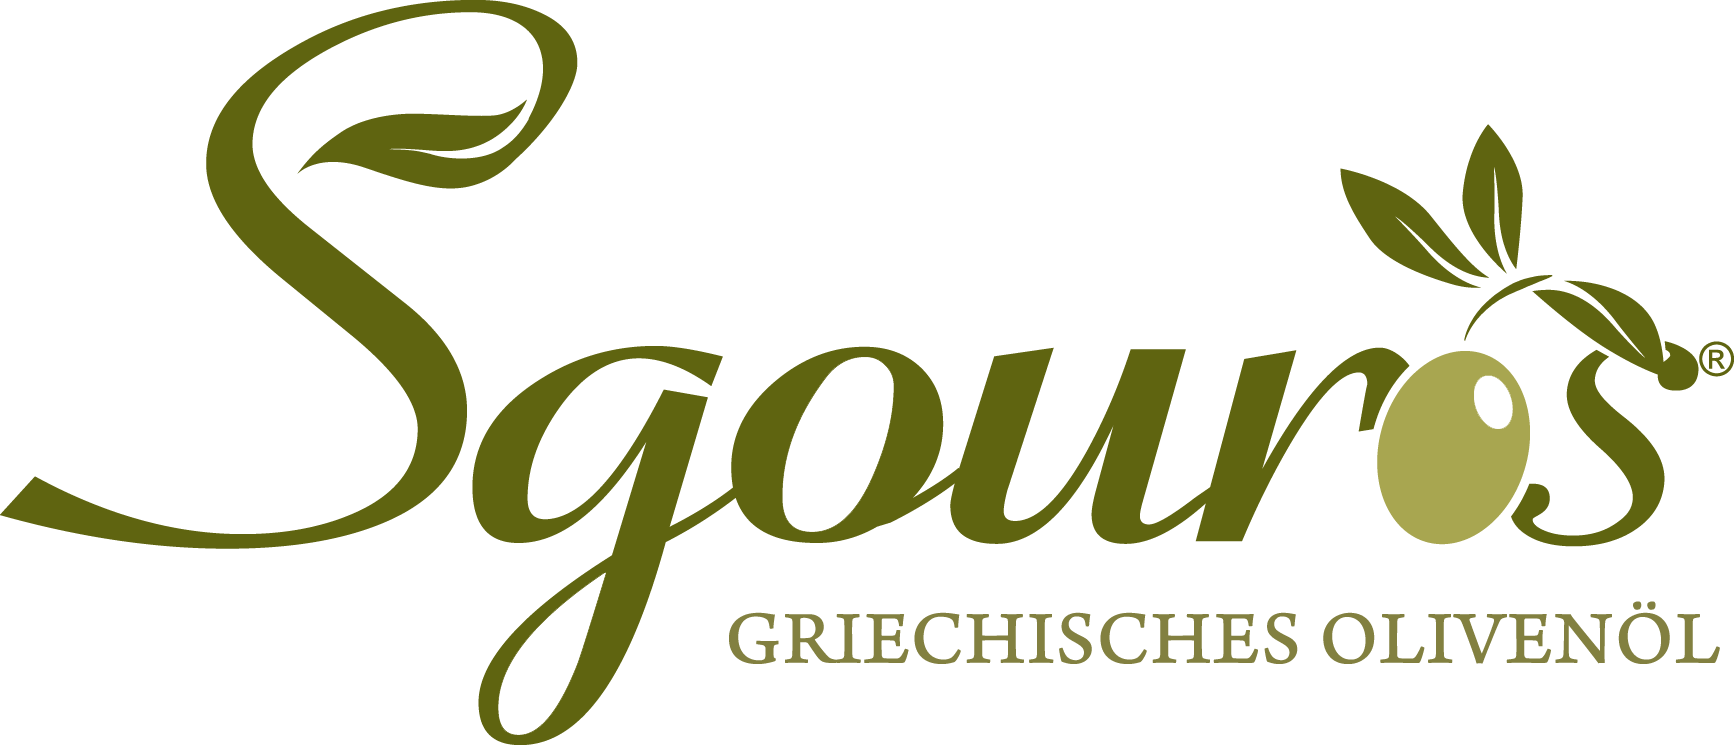 Sgouros Olivenöl-Logo